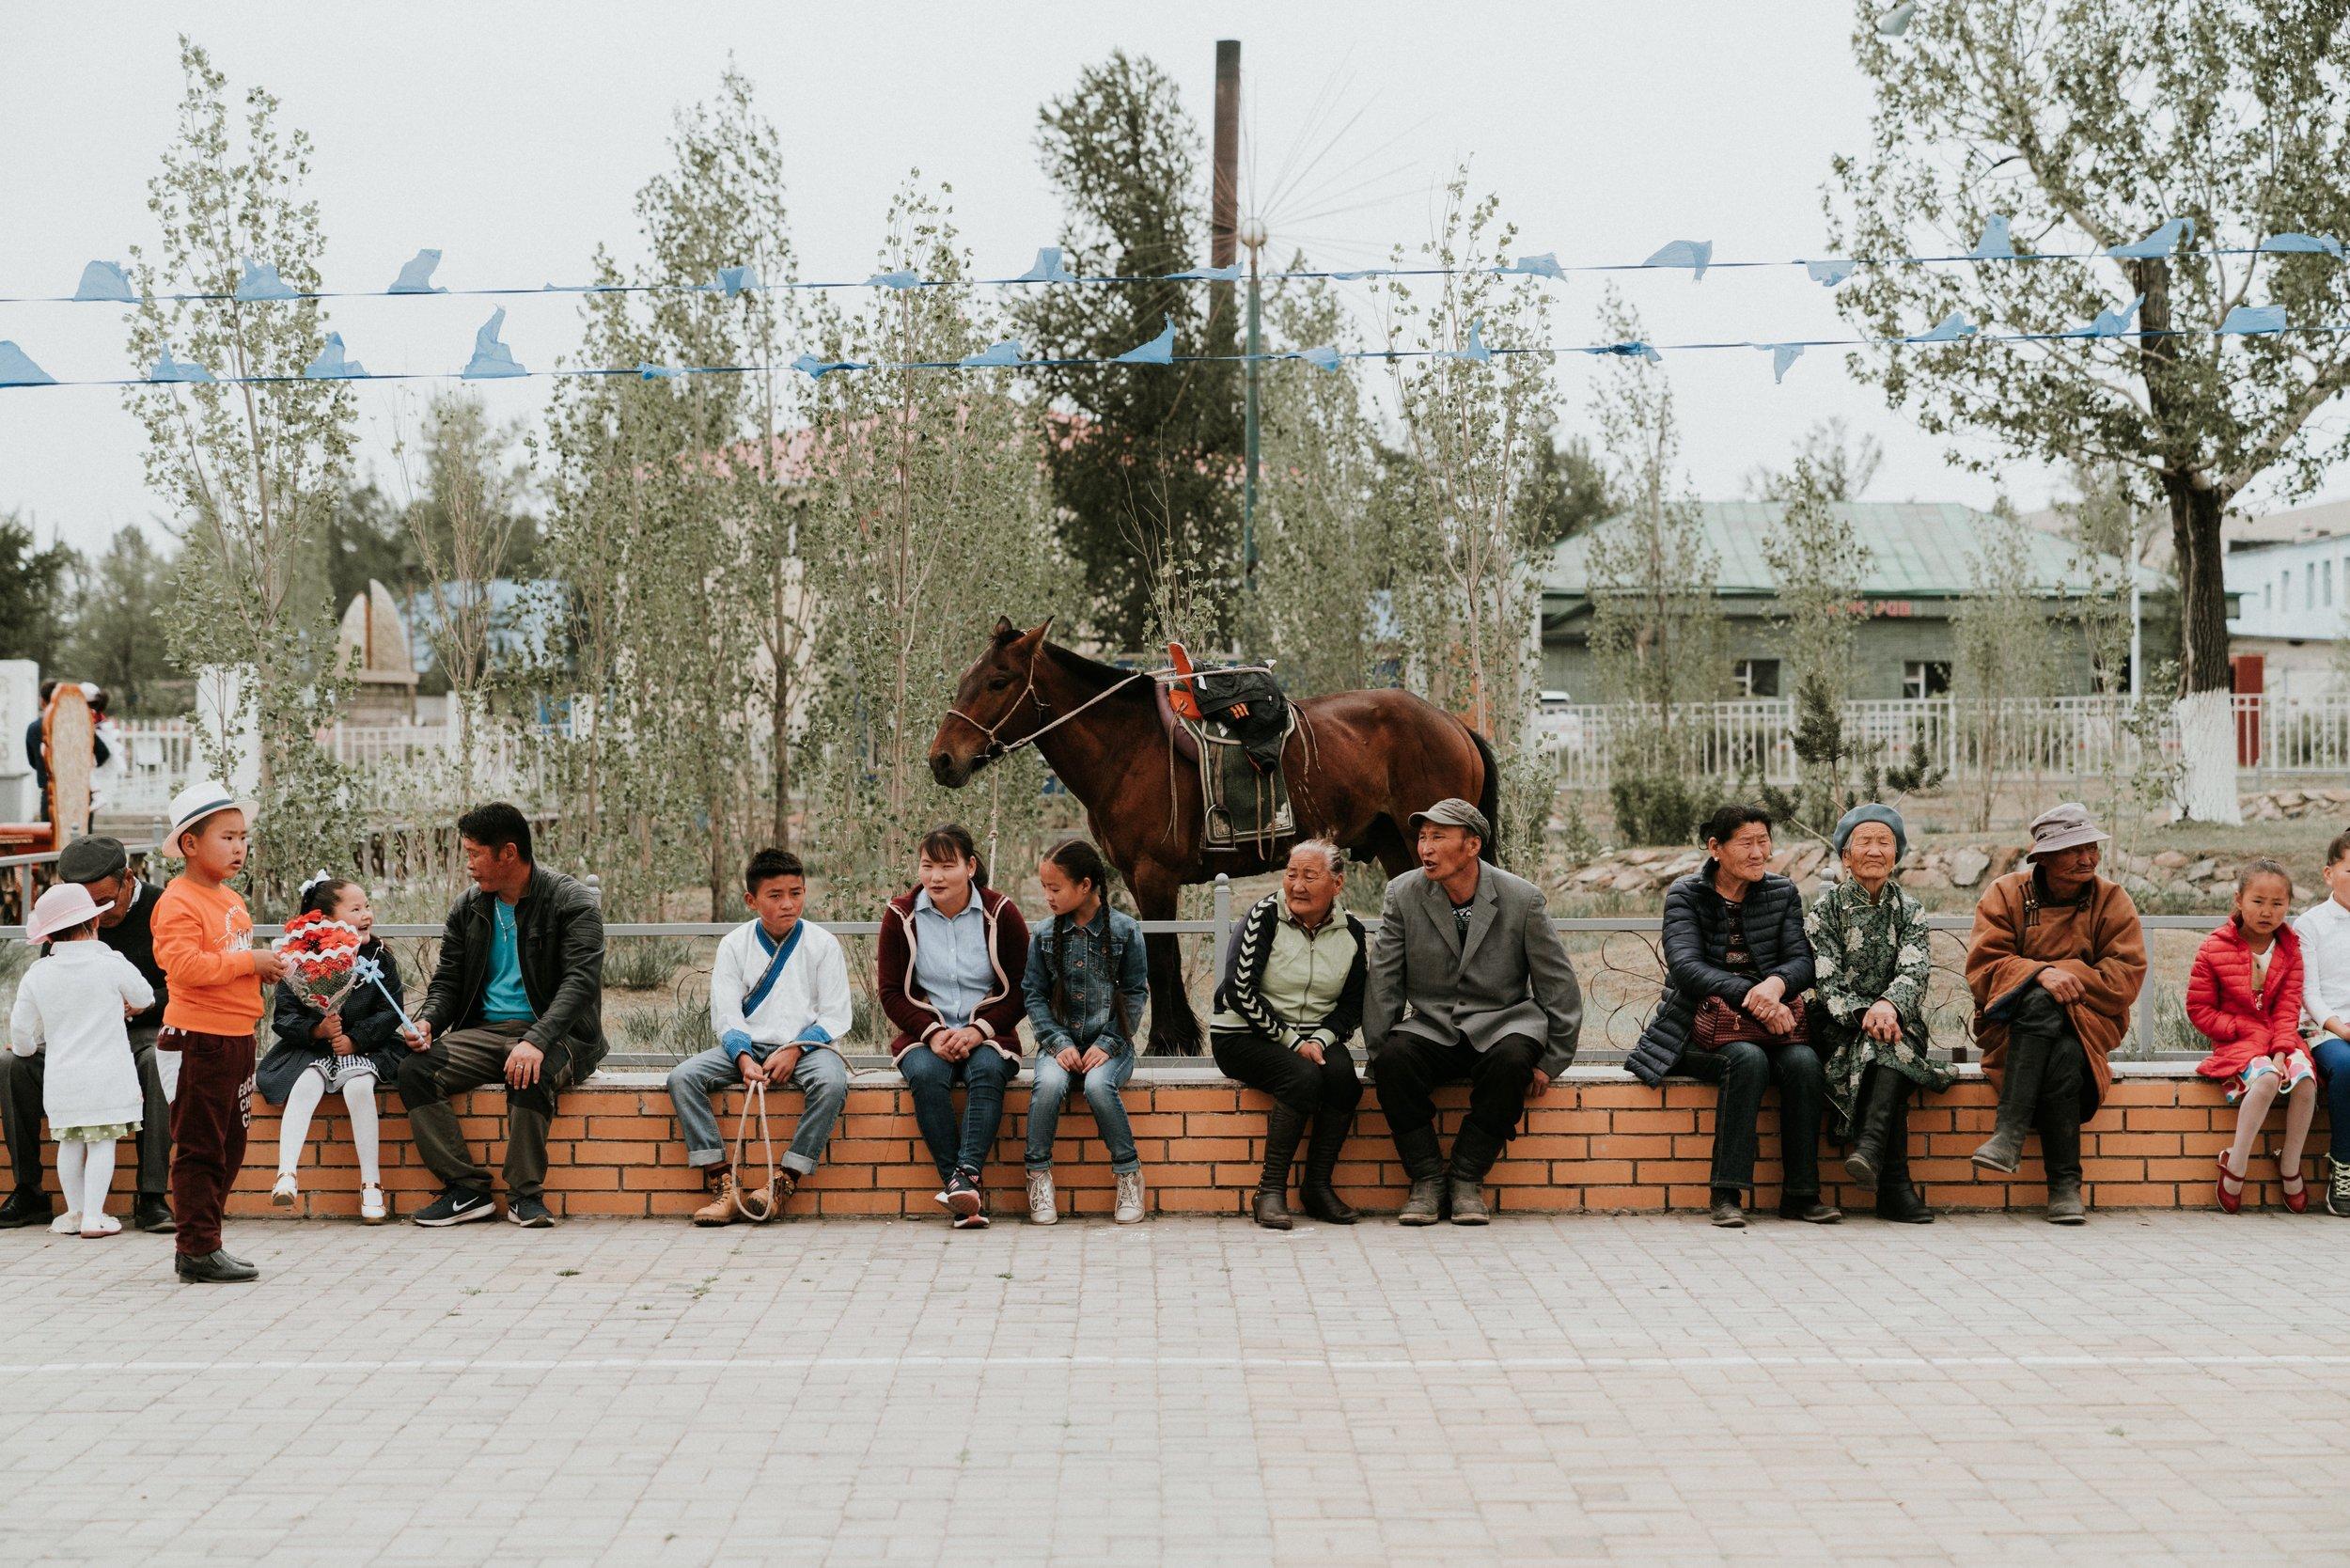 Mongolia_2018 (287 of 403) copy.jpg